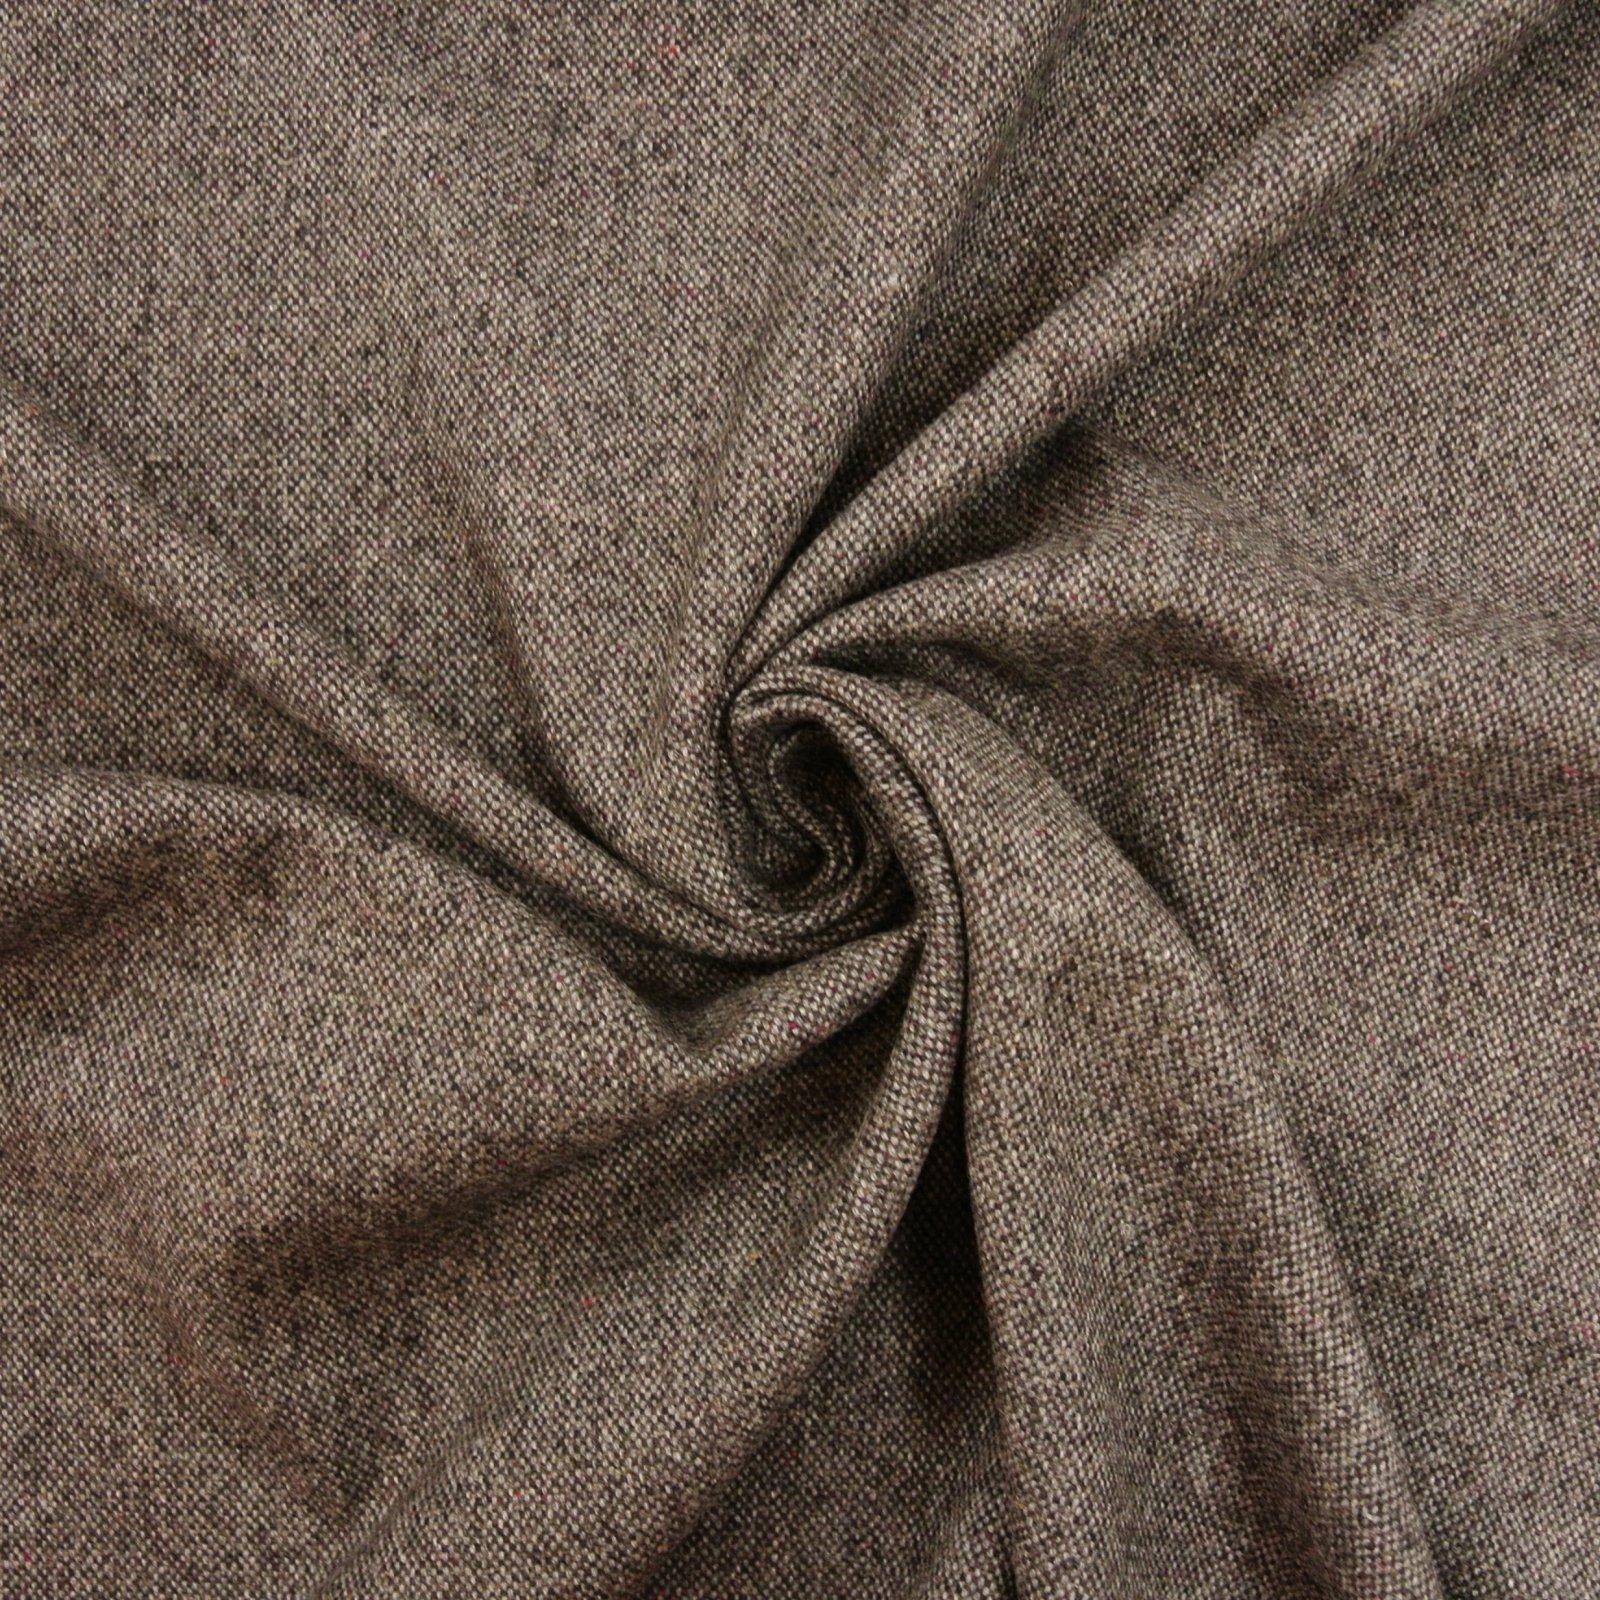 Wool Tweed charcoal